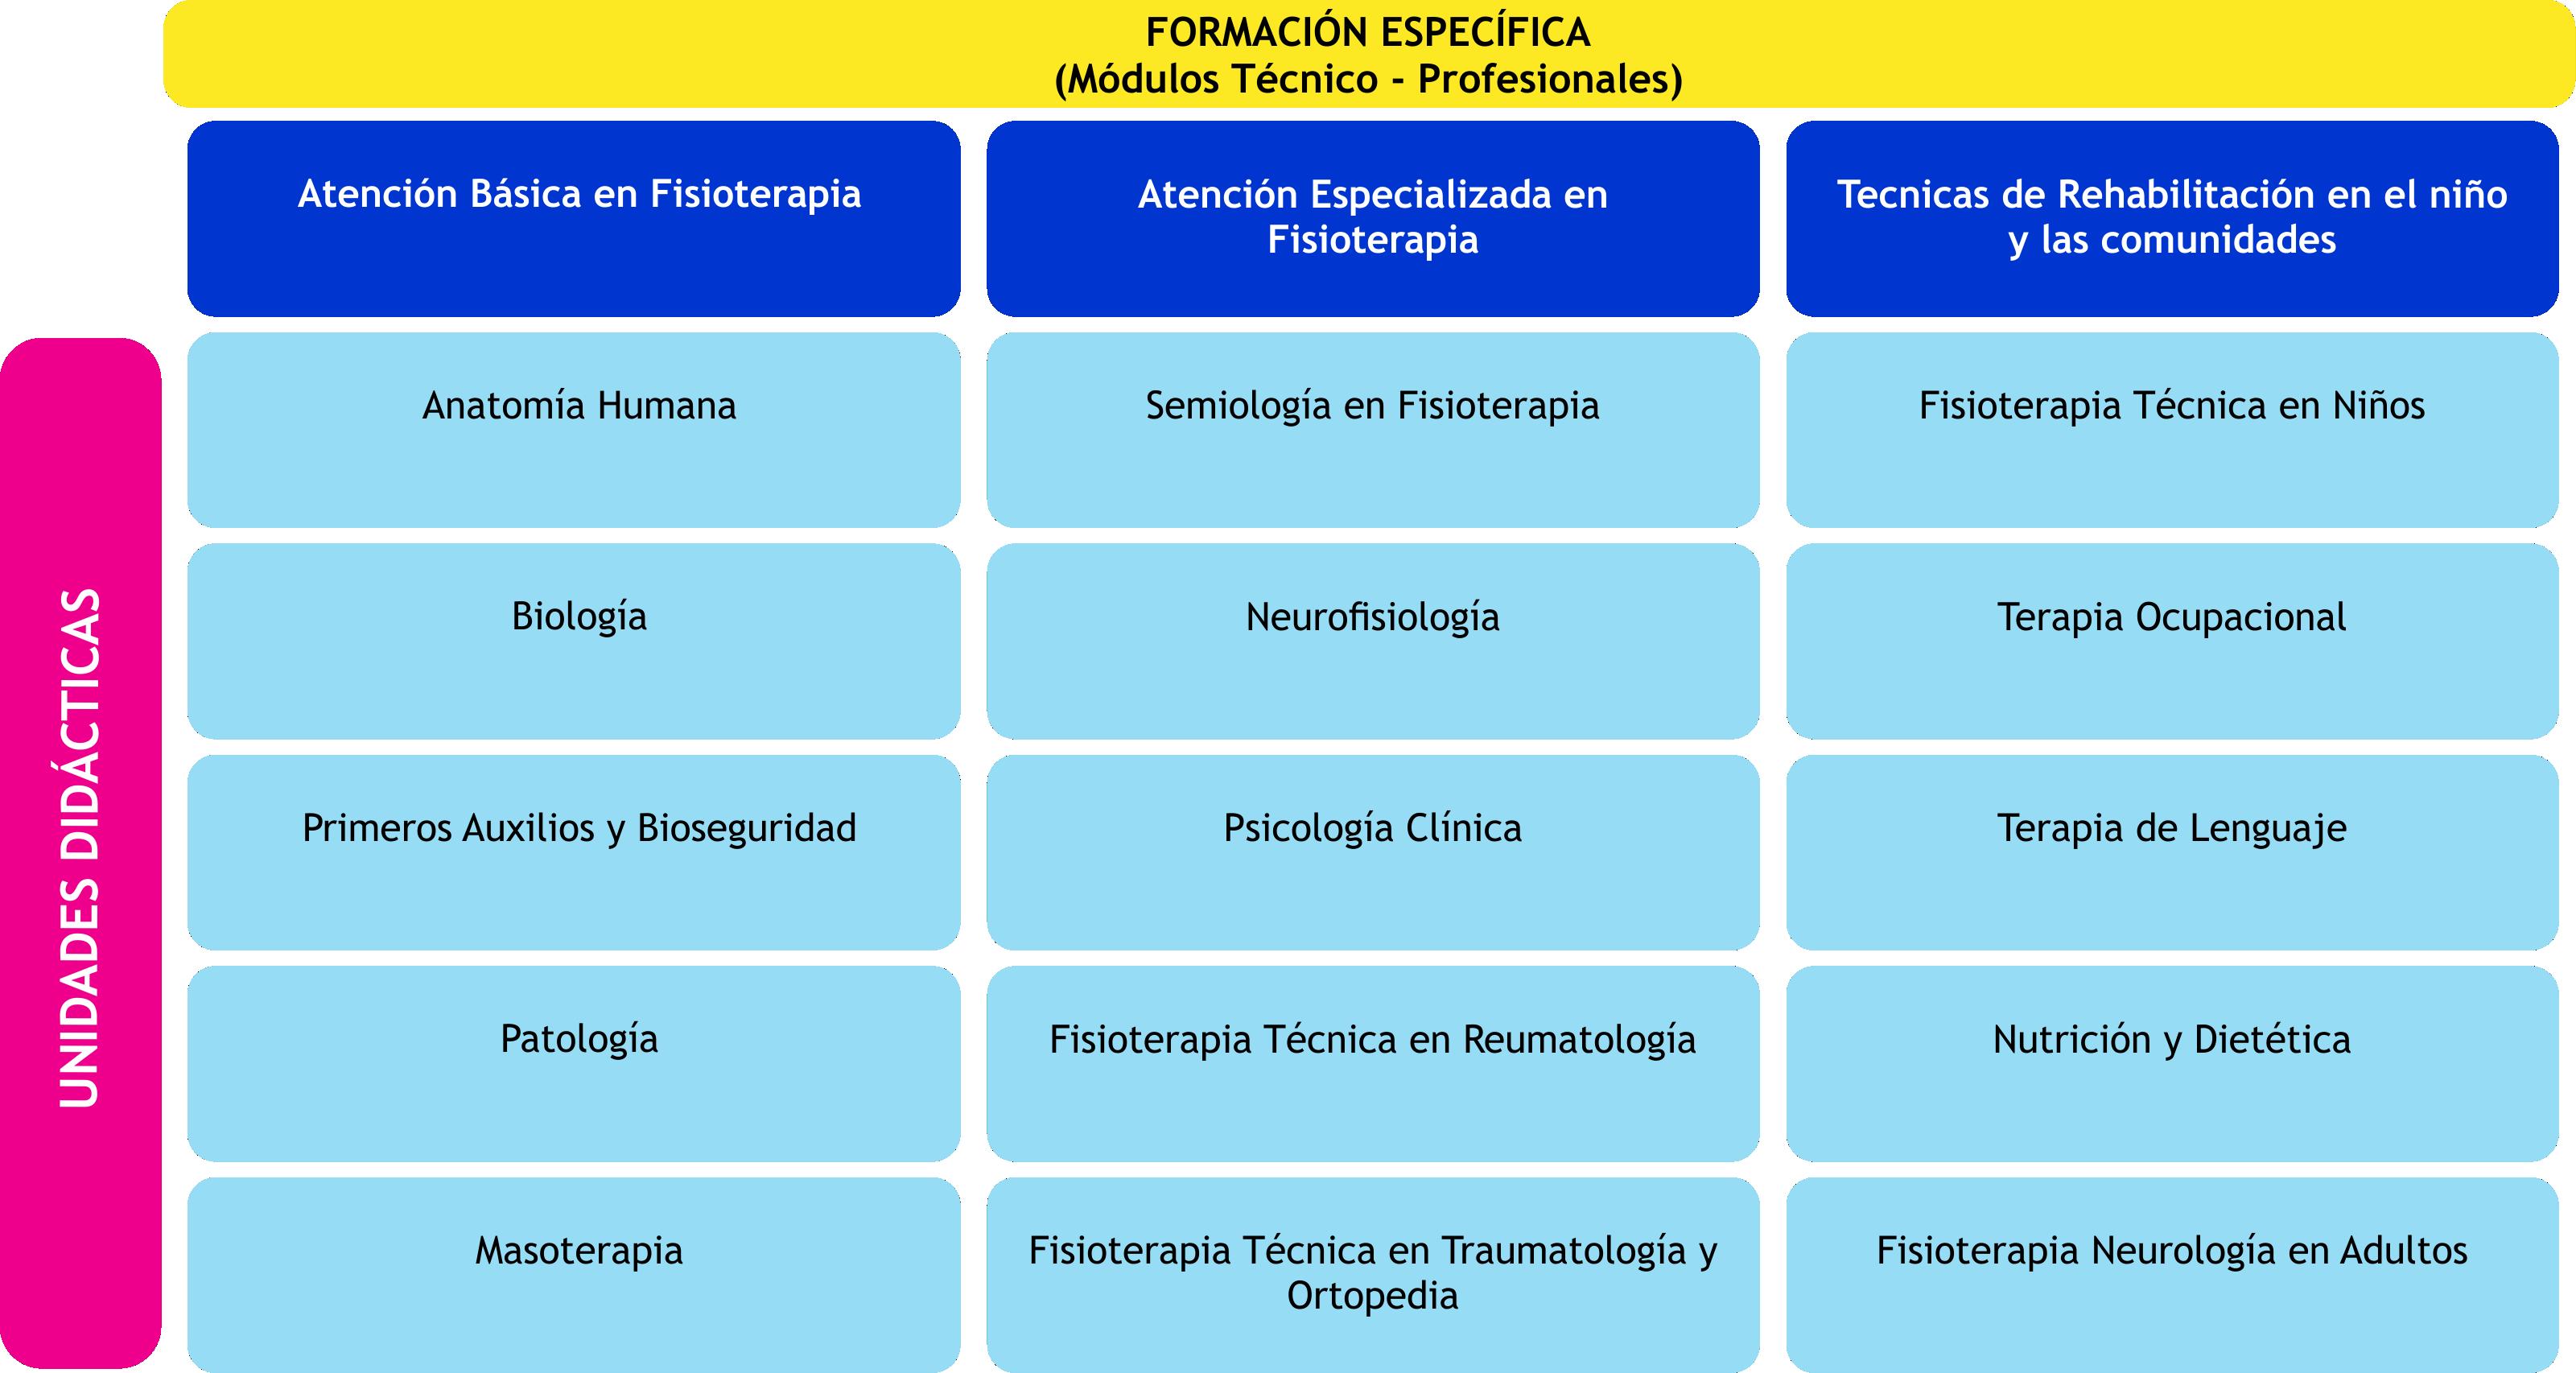 mallaFisioterapia